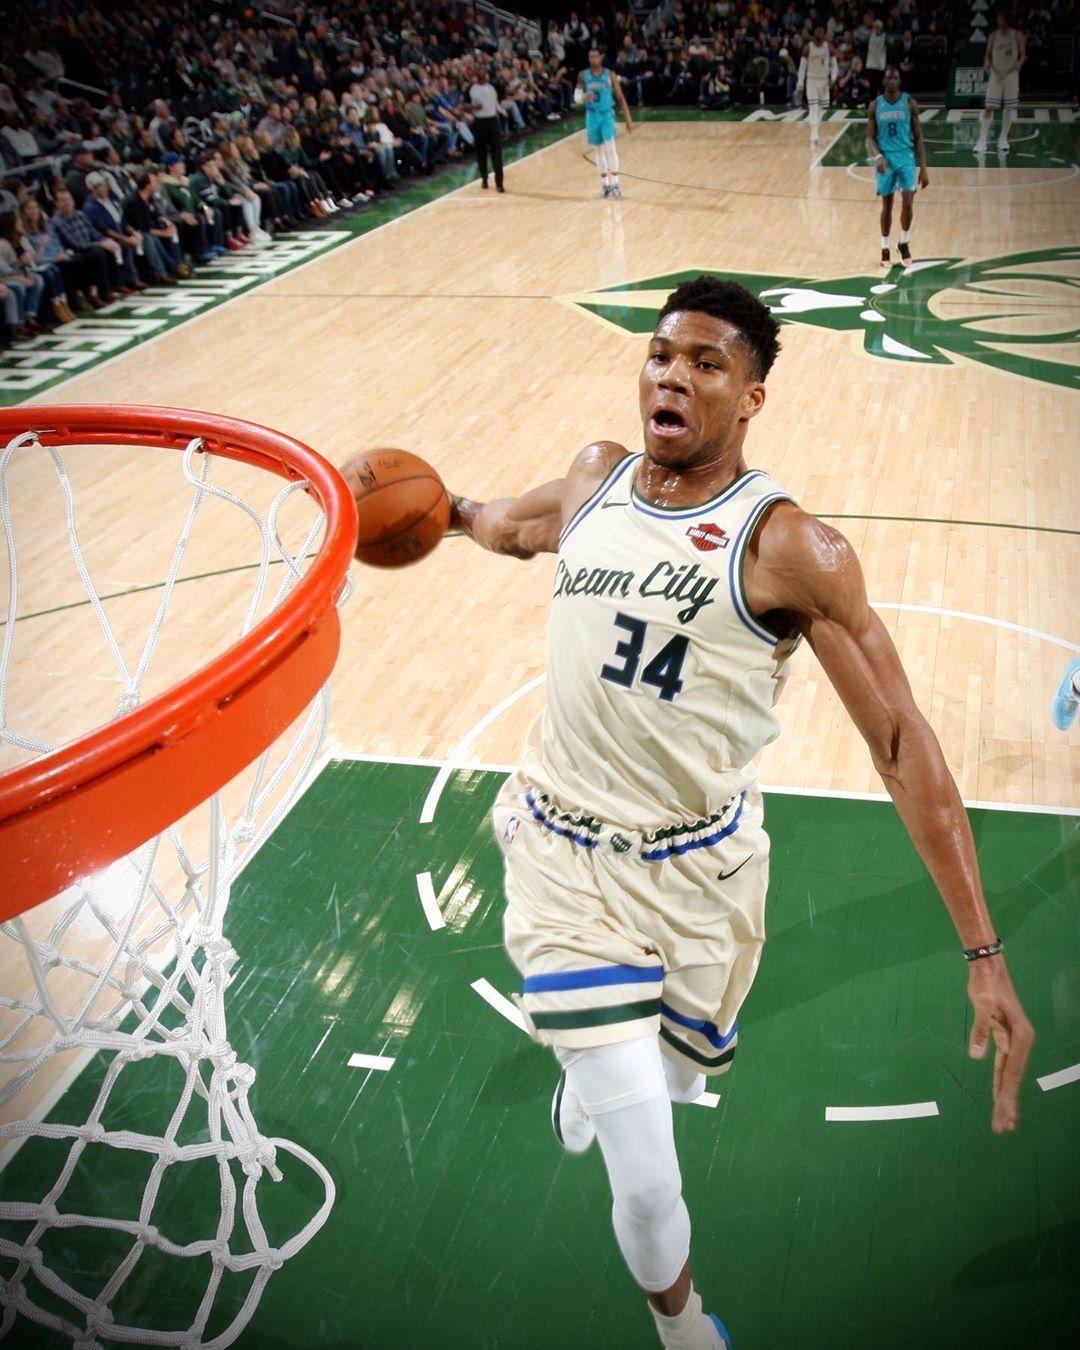 Nba Tap To Shop Basketball Big4 Bigfour Big4 Bigfour Big4 Bigfour Nationalbas Nba Pictures Nba Basketball Art Basketball Players Nba